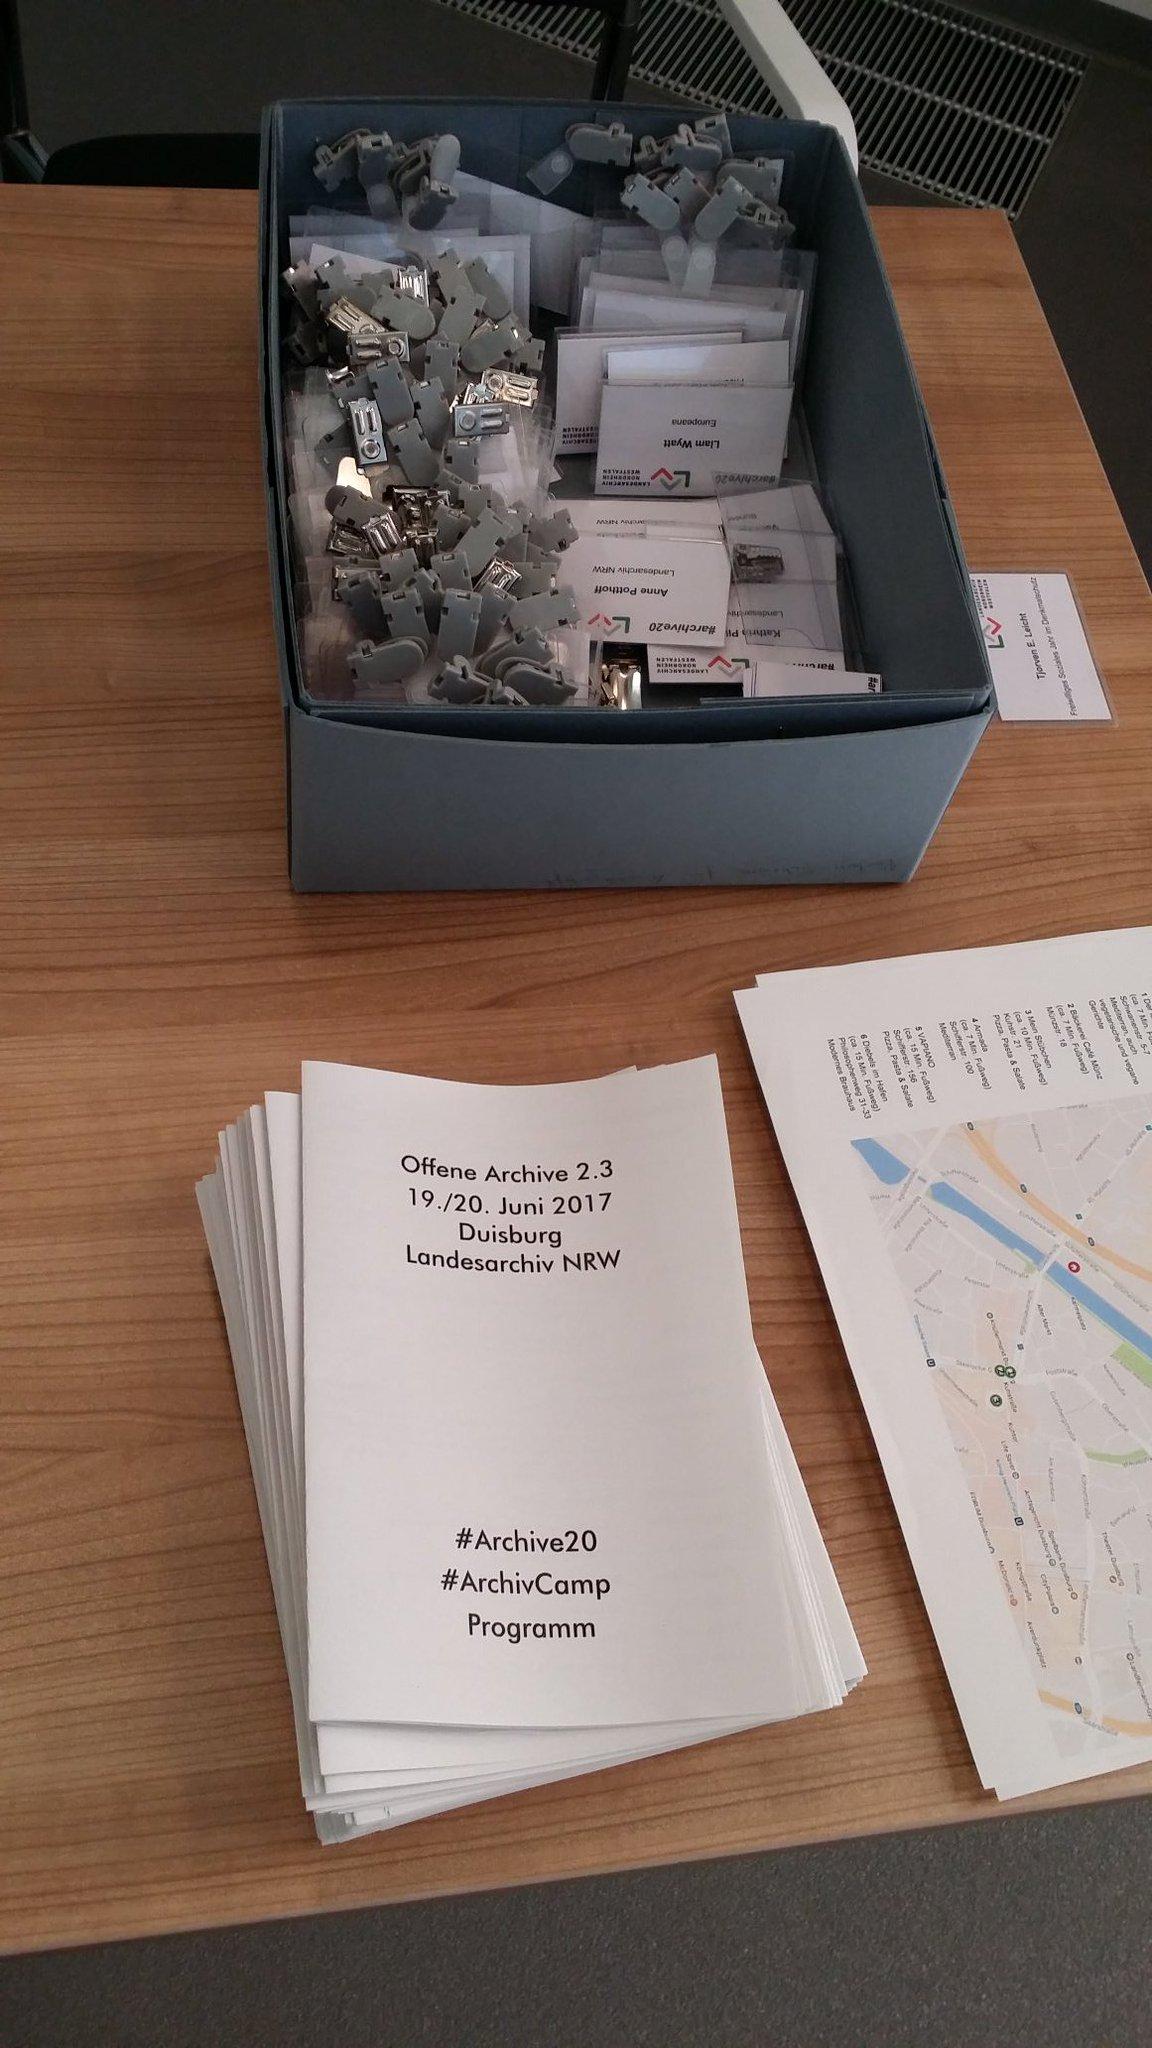 #archive20 #archivcamp https://t.co/g7TIylh5Lu